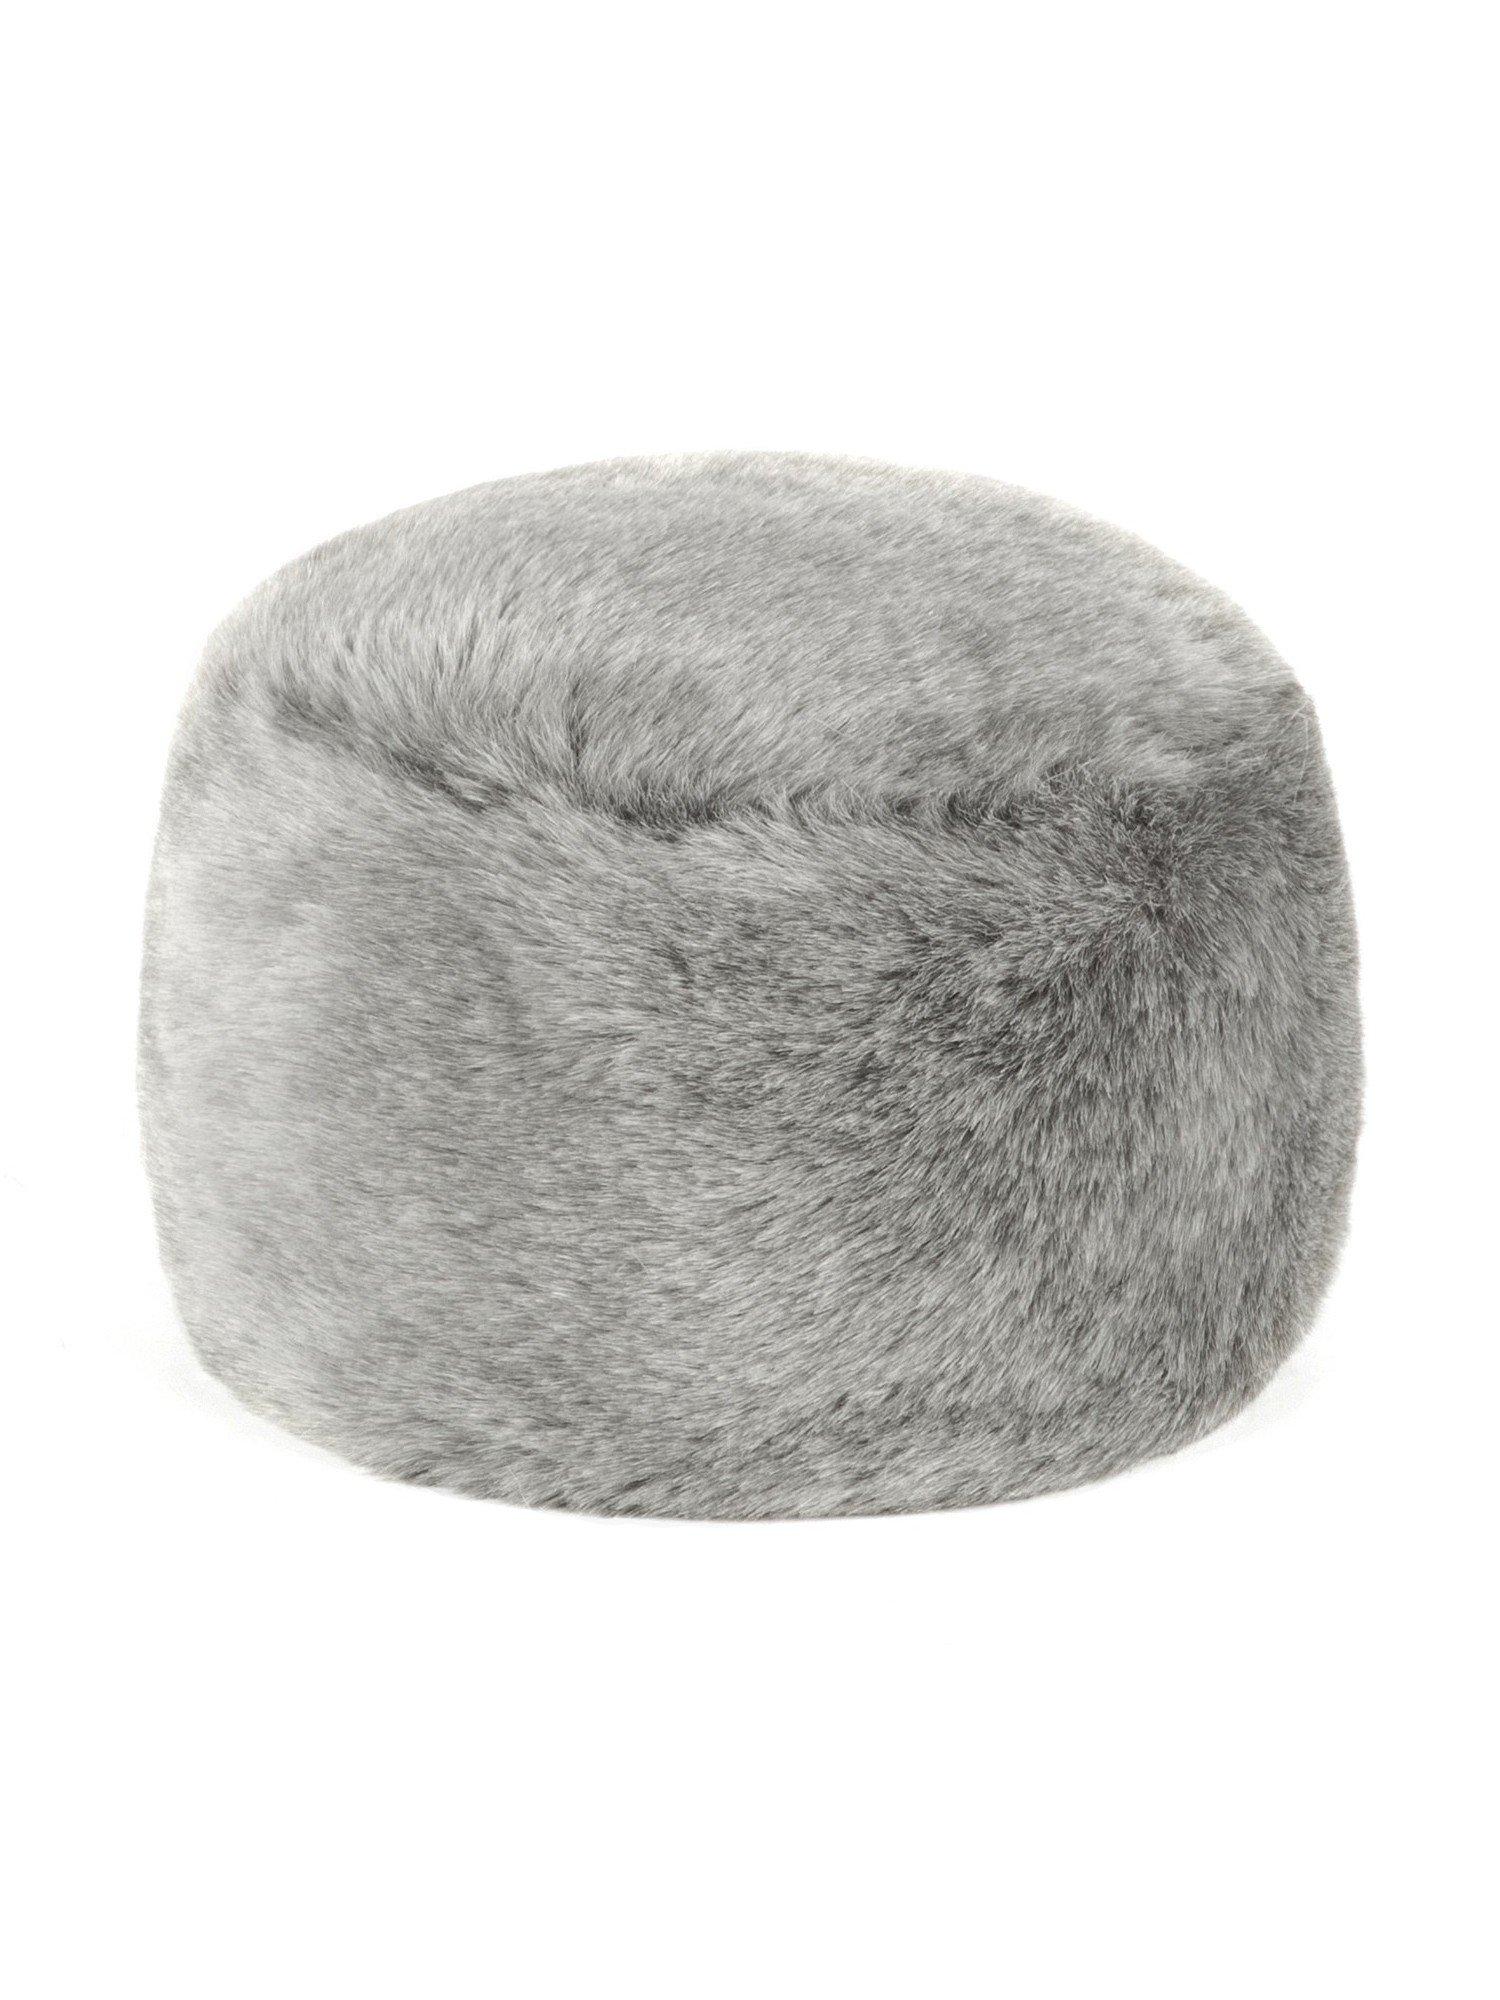 Futrzane Women's Fur Hat Russian Cossack Made of Faux Rabbit Fur (S, Grey)